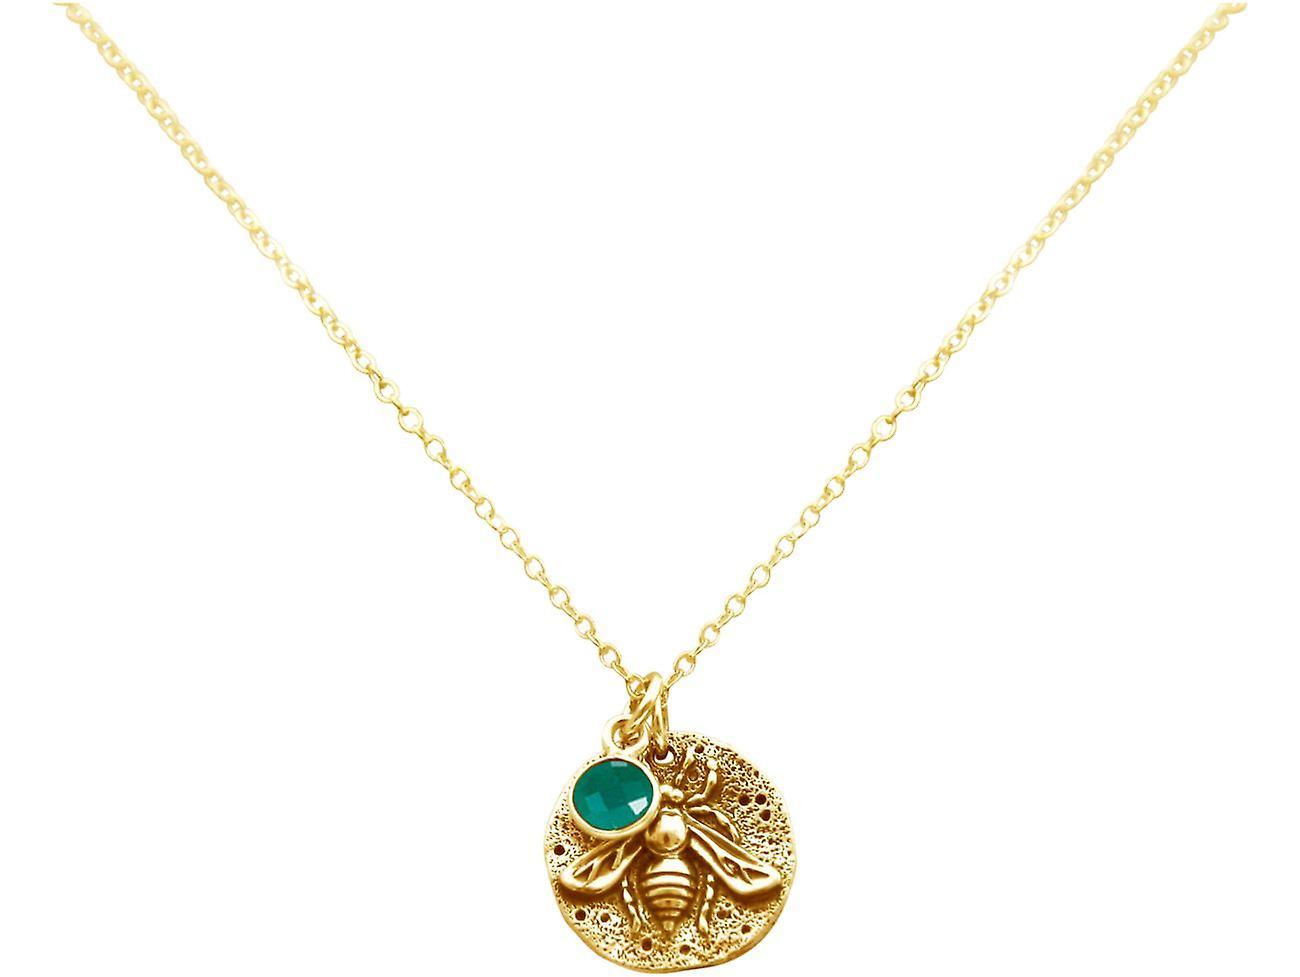 Gemshine BIENE Halskette Münze Anhänger 925 Silber, vergoldet, rose - Smaragd